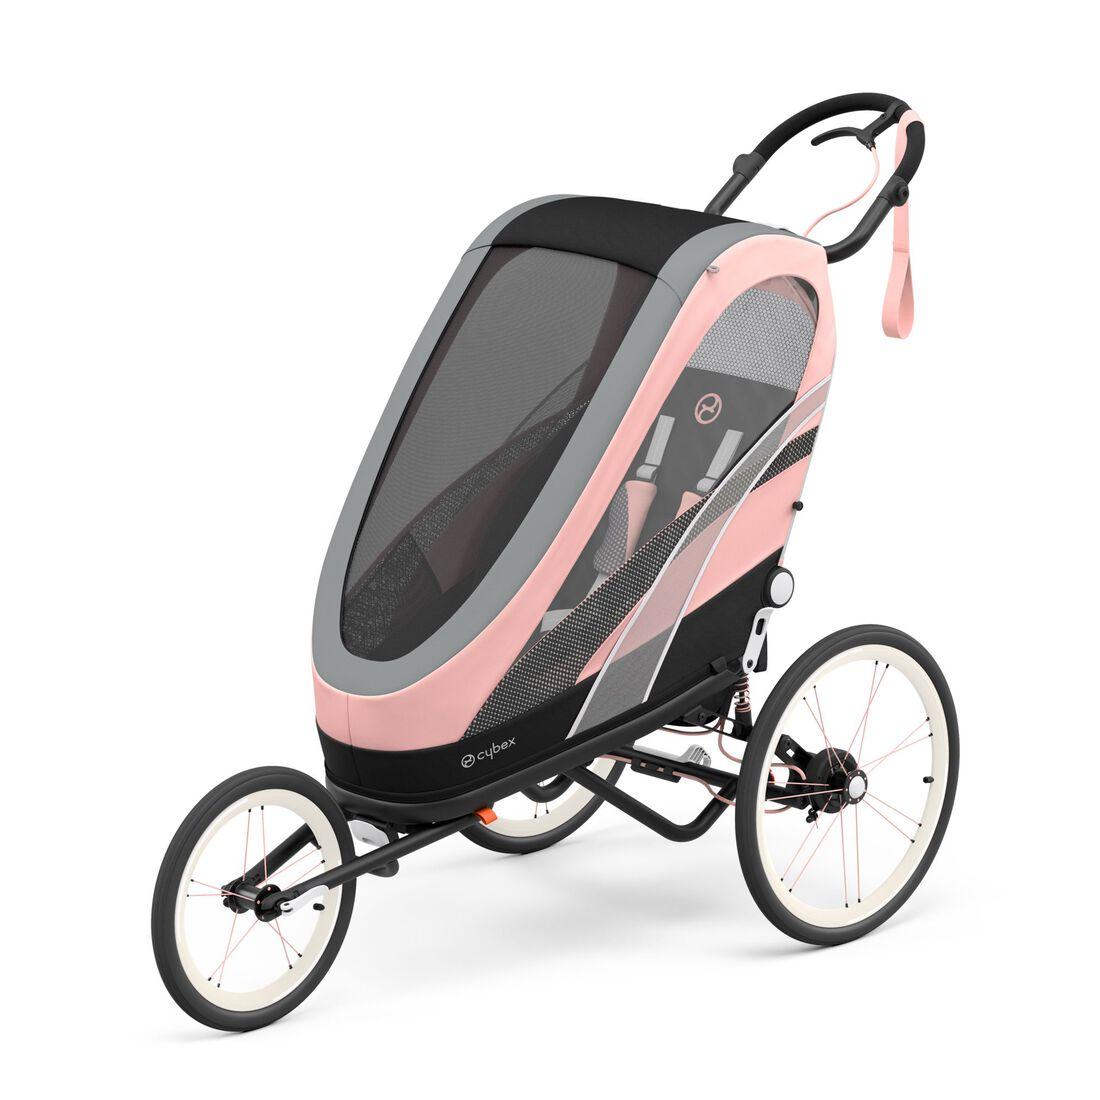 CYBEX Zeno Sitzpaket - Silver Pink in Silver Pink large Bild 2